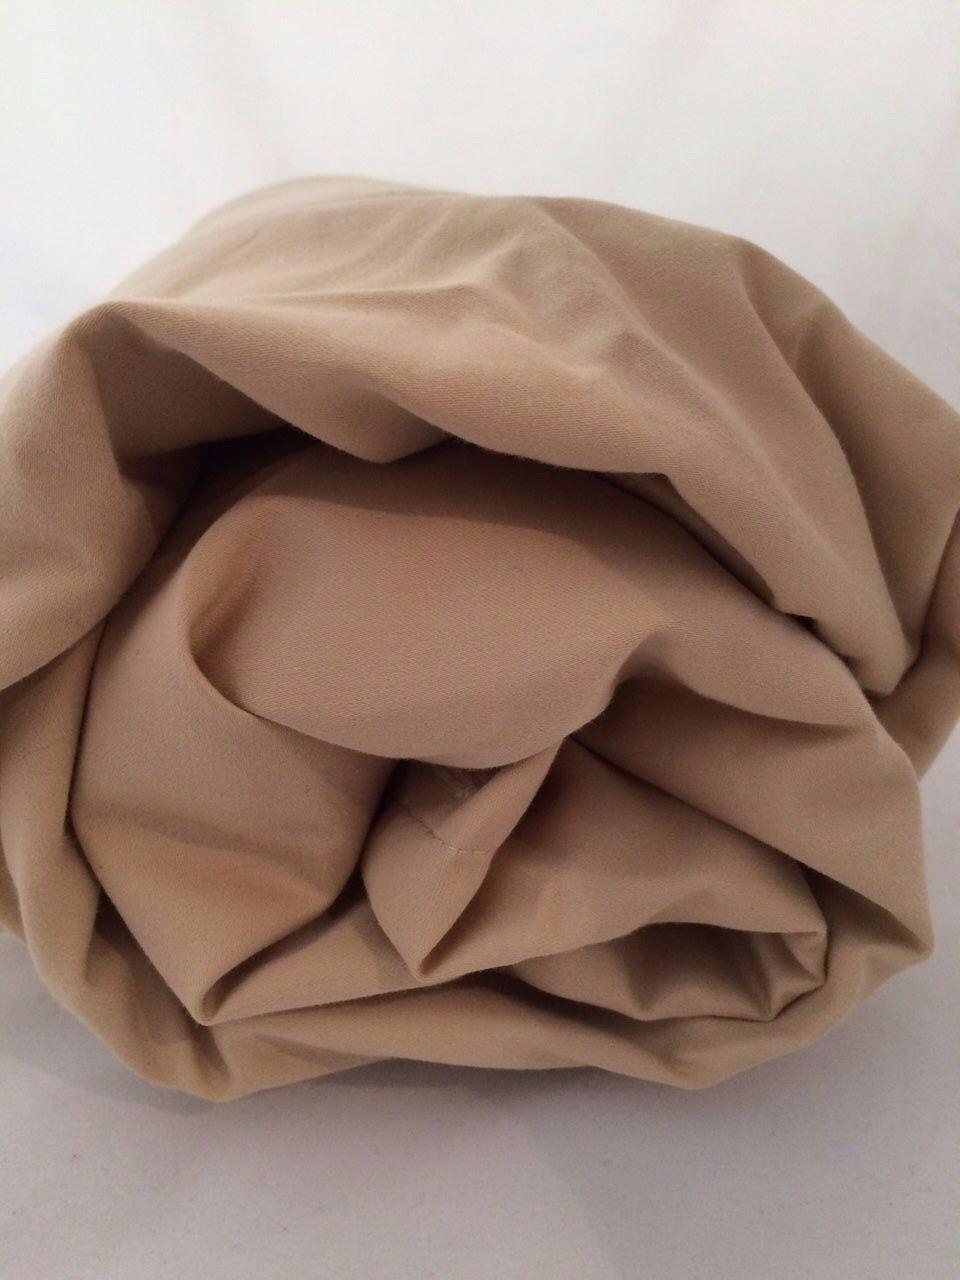 Pebble König Duvet Comforter Startseite 450TC Wrinkle Free Company Store FL Beige Sand